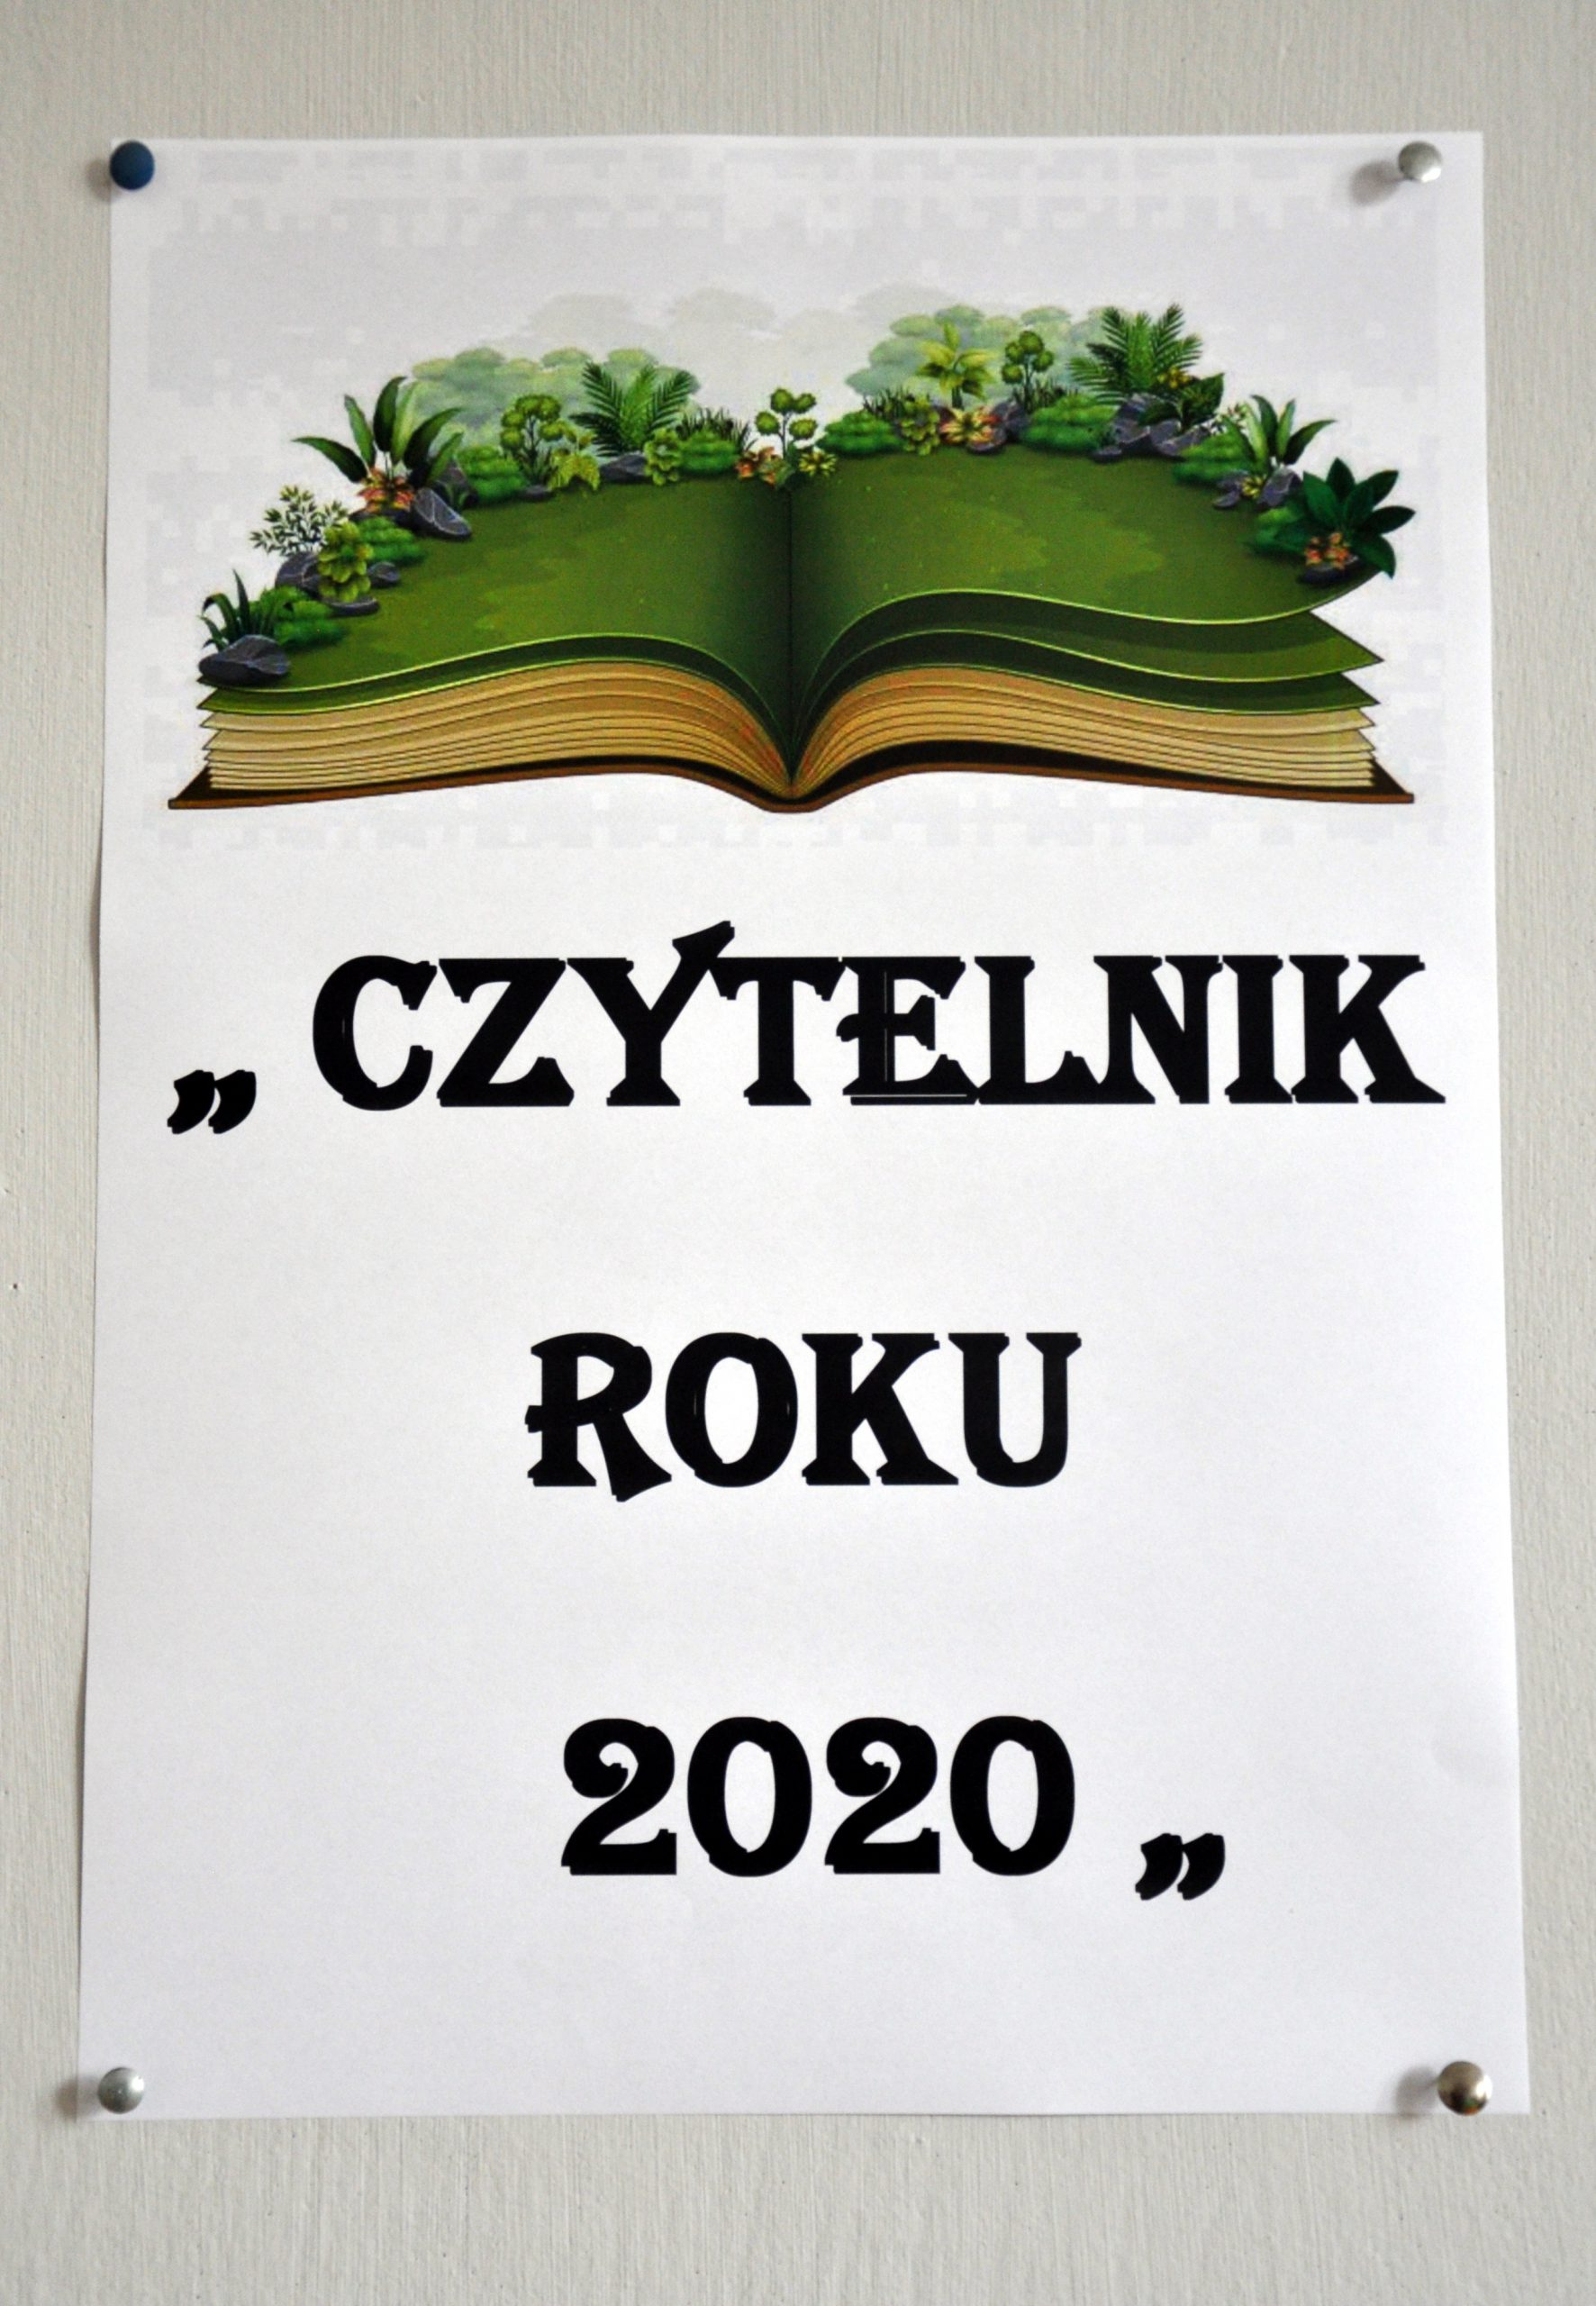 CZYTELNIK ROKU 2020